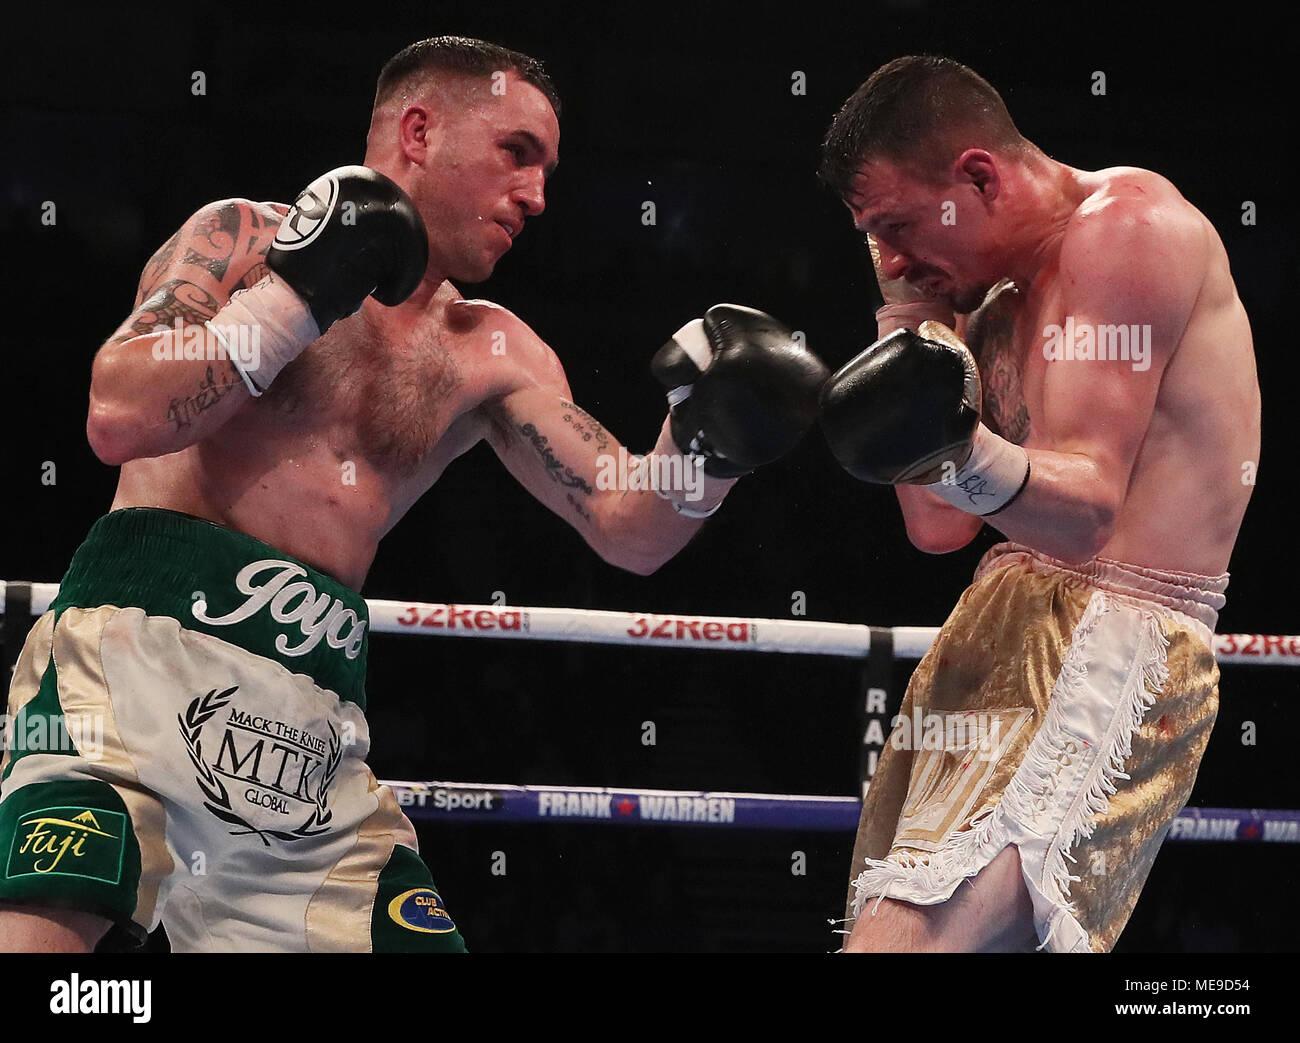 David Oliver Joyce (left) against Jordan Ellison during their International Lightweight bout at the SSE Arena, Belfast. Stock Photo